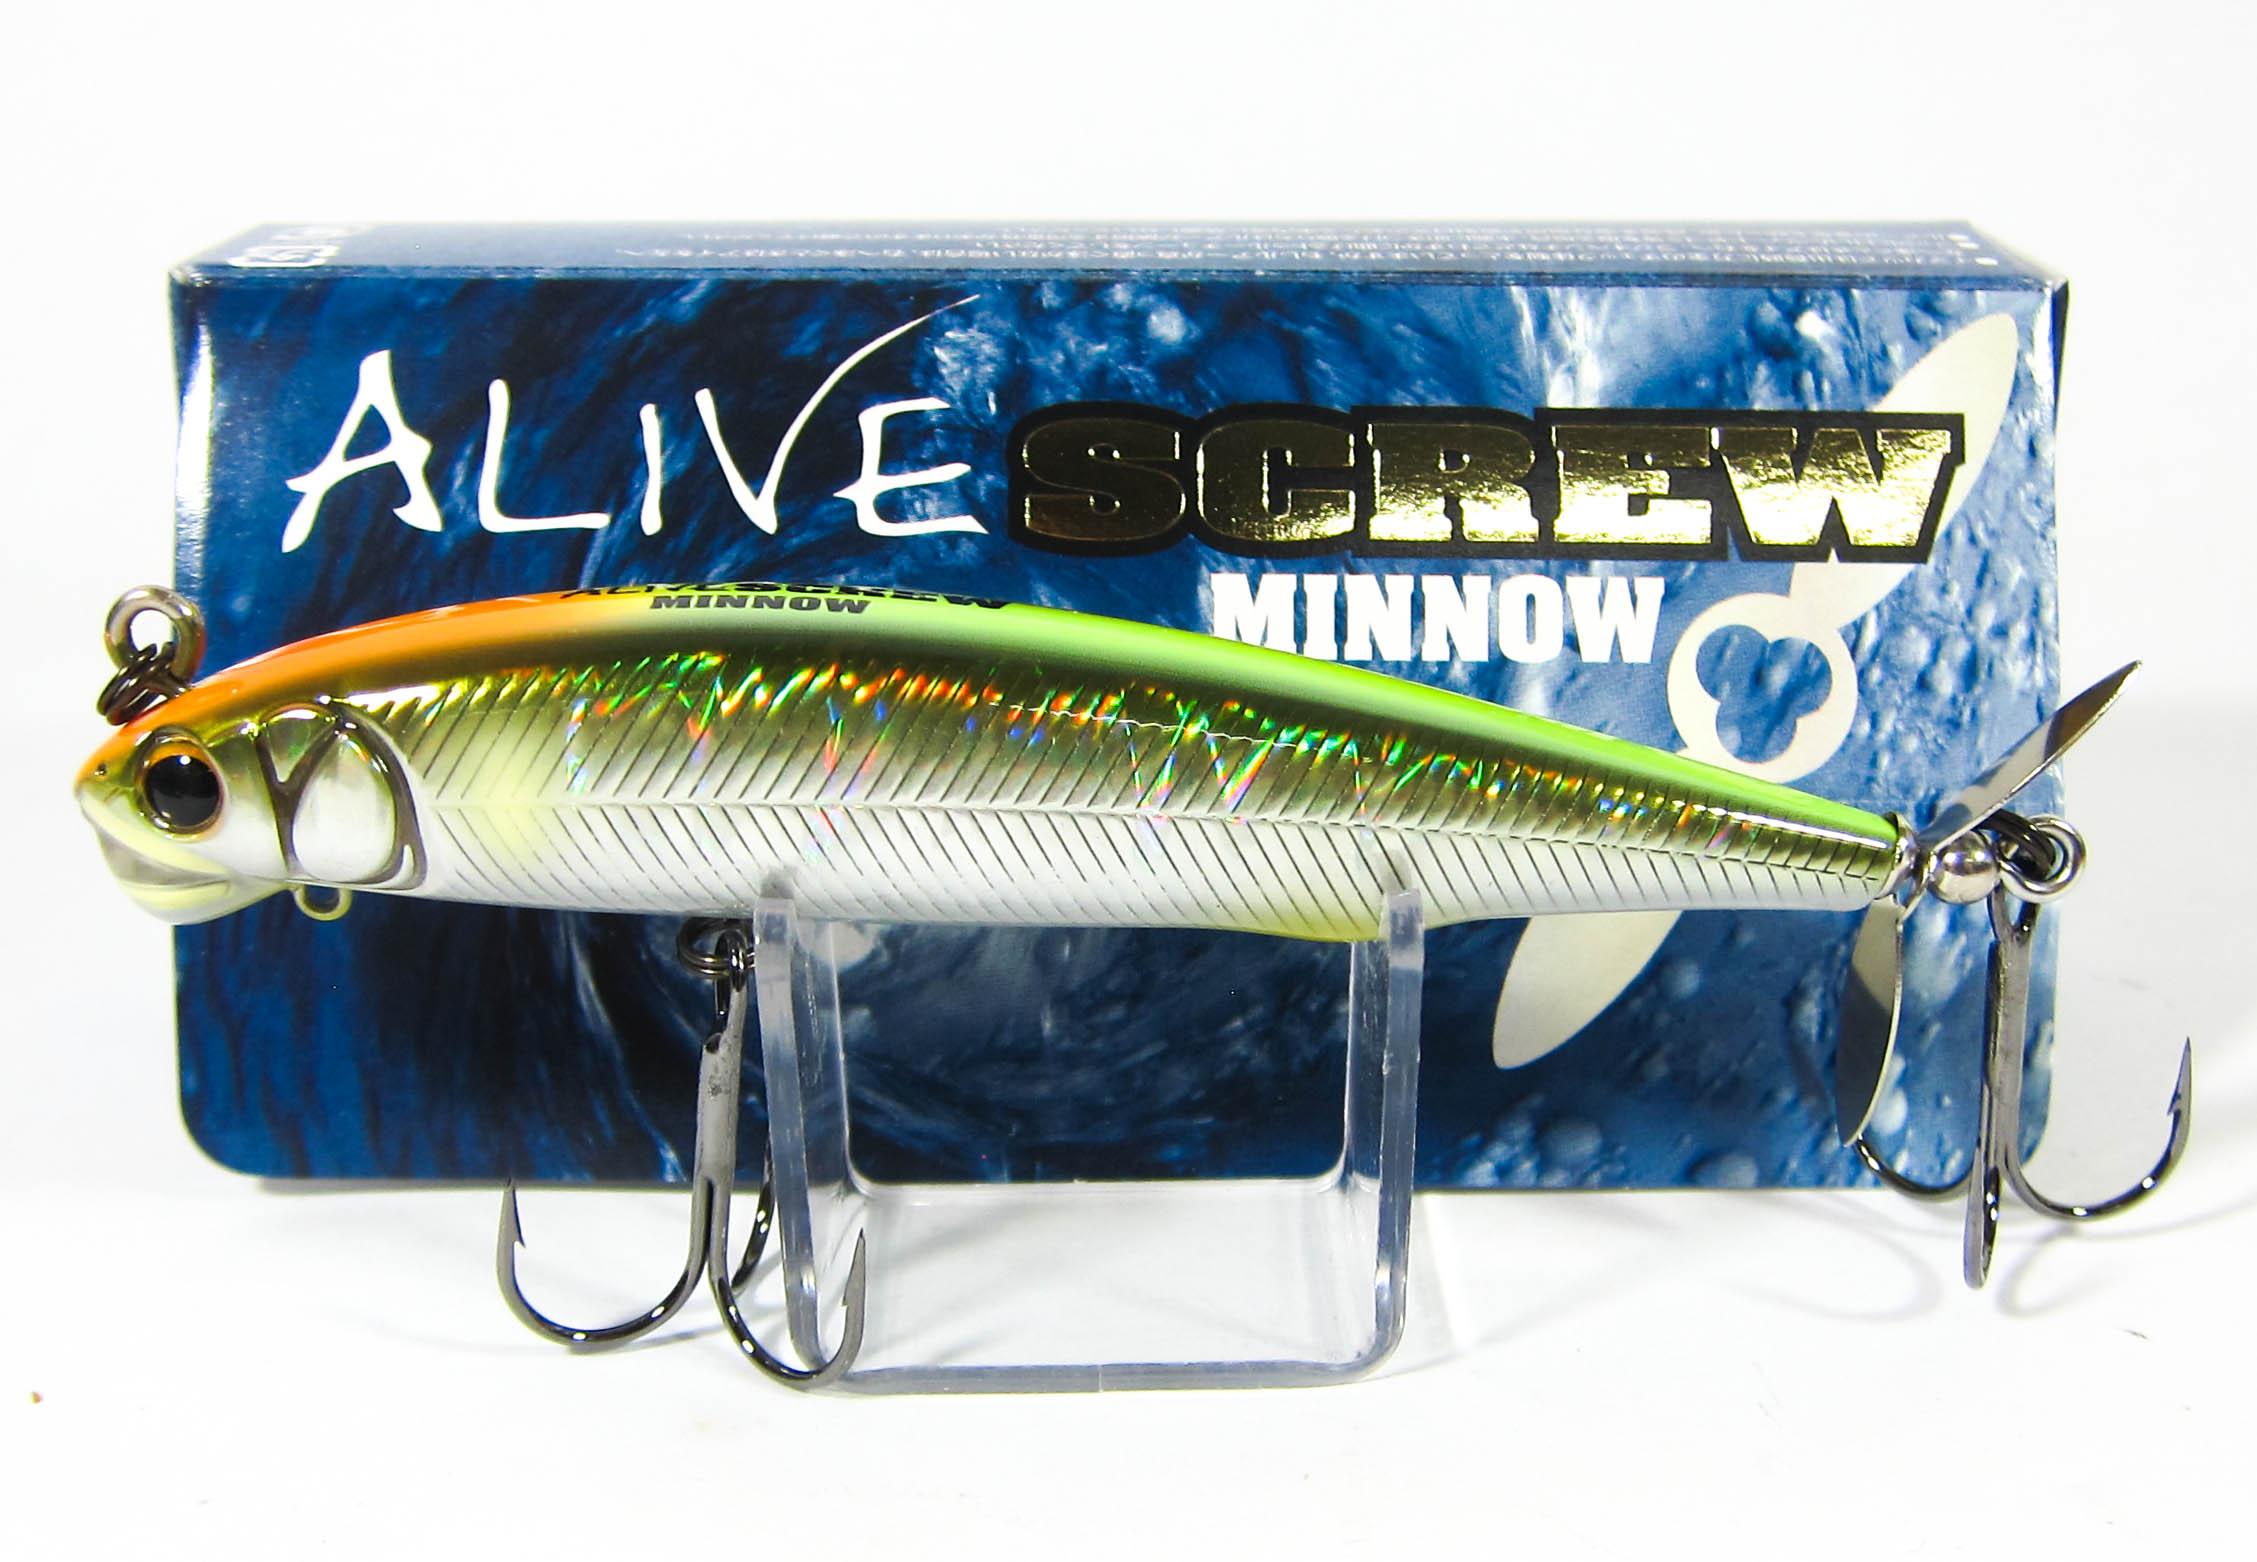 Imakatsu Alive Screw Minnow 90 Sinking Lure 127 (2957)